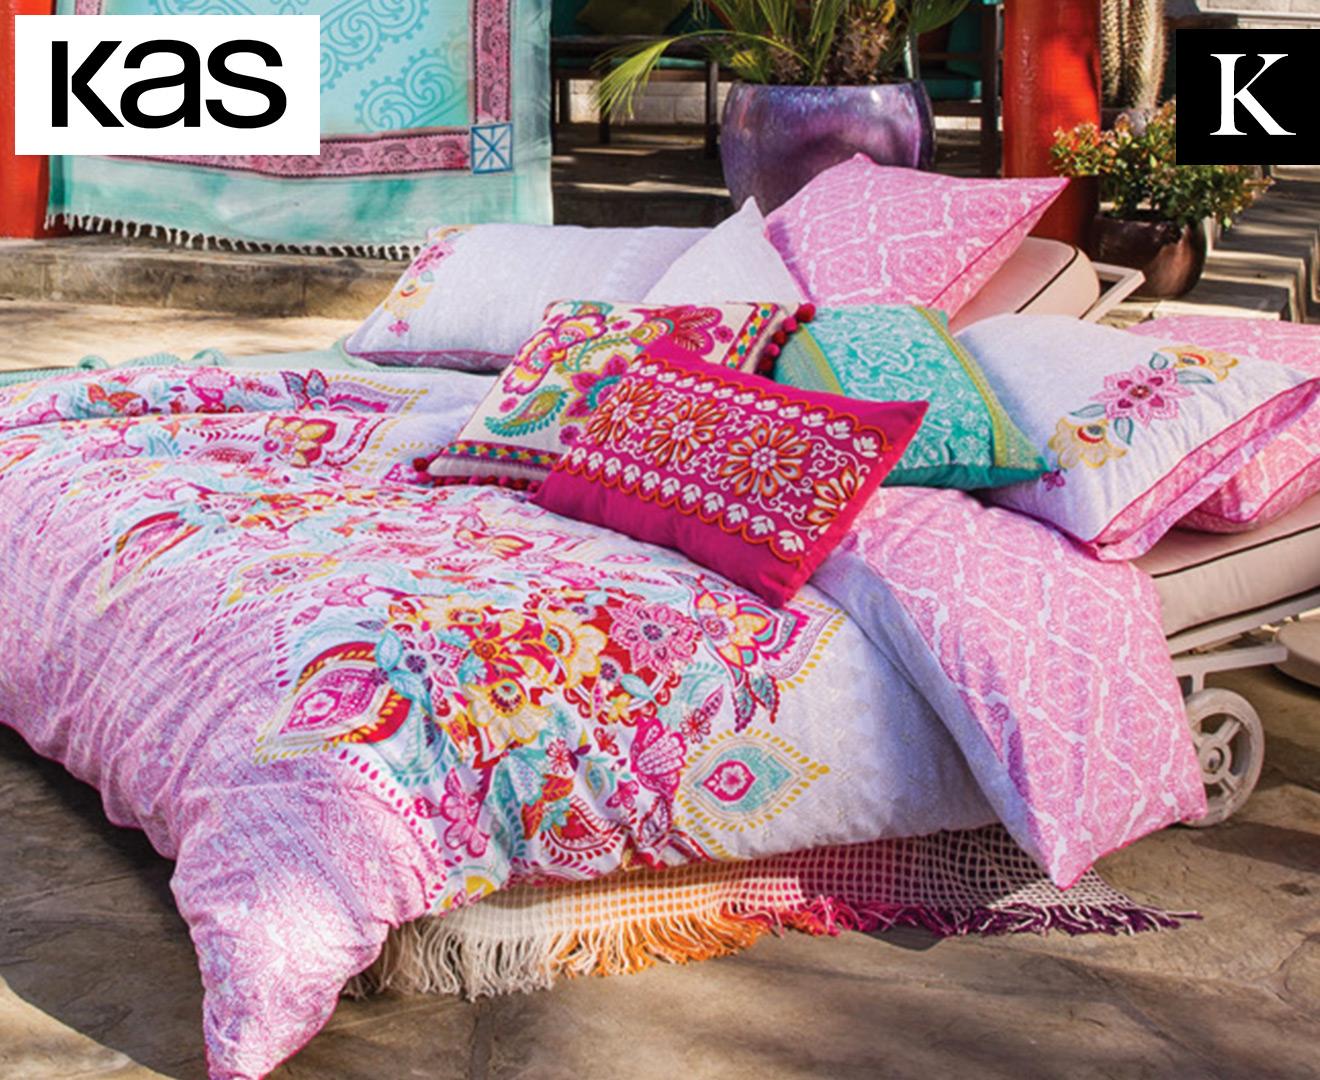 KAS Varana Reversible King Bed Quilt Cover Set - Multi